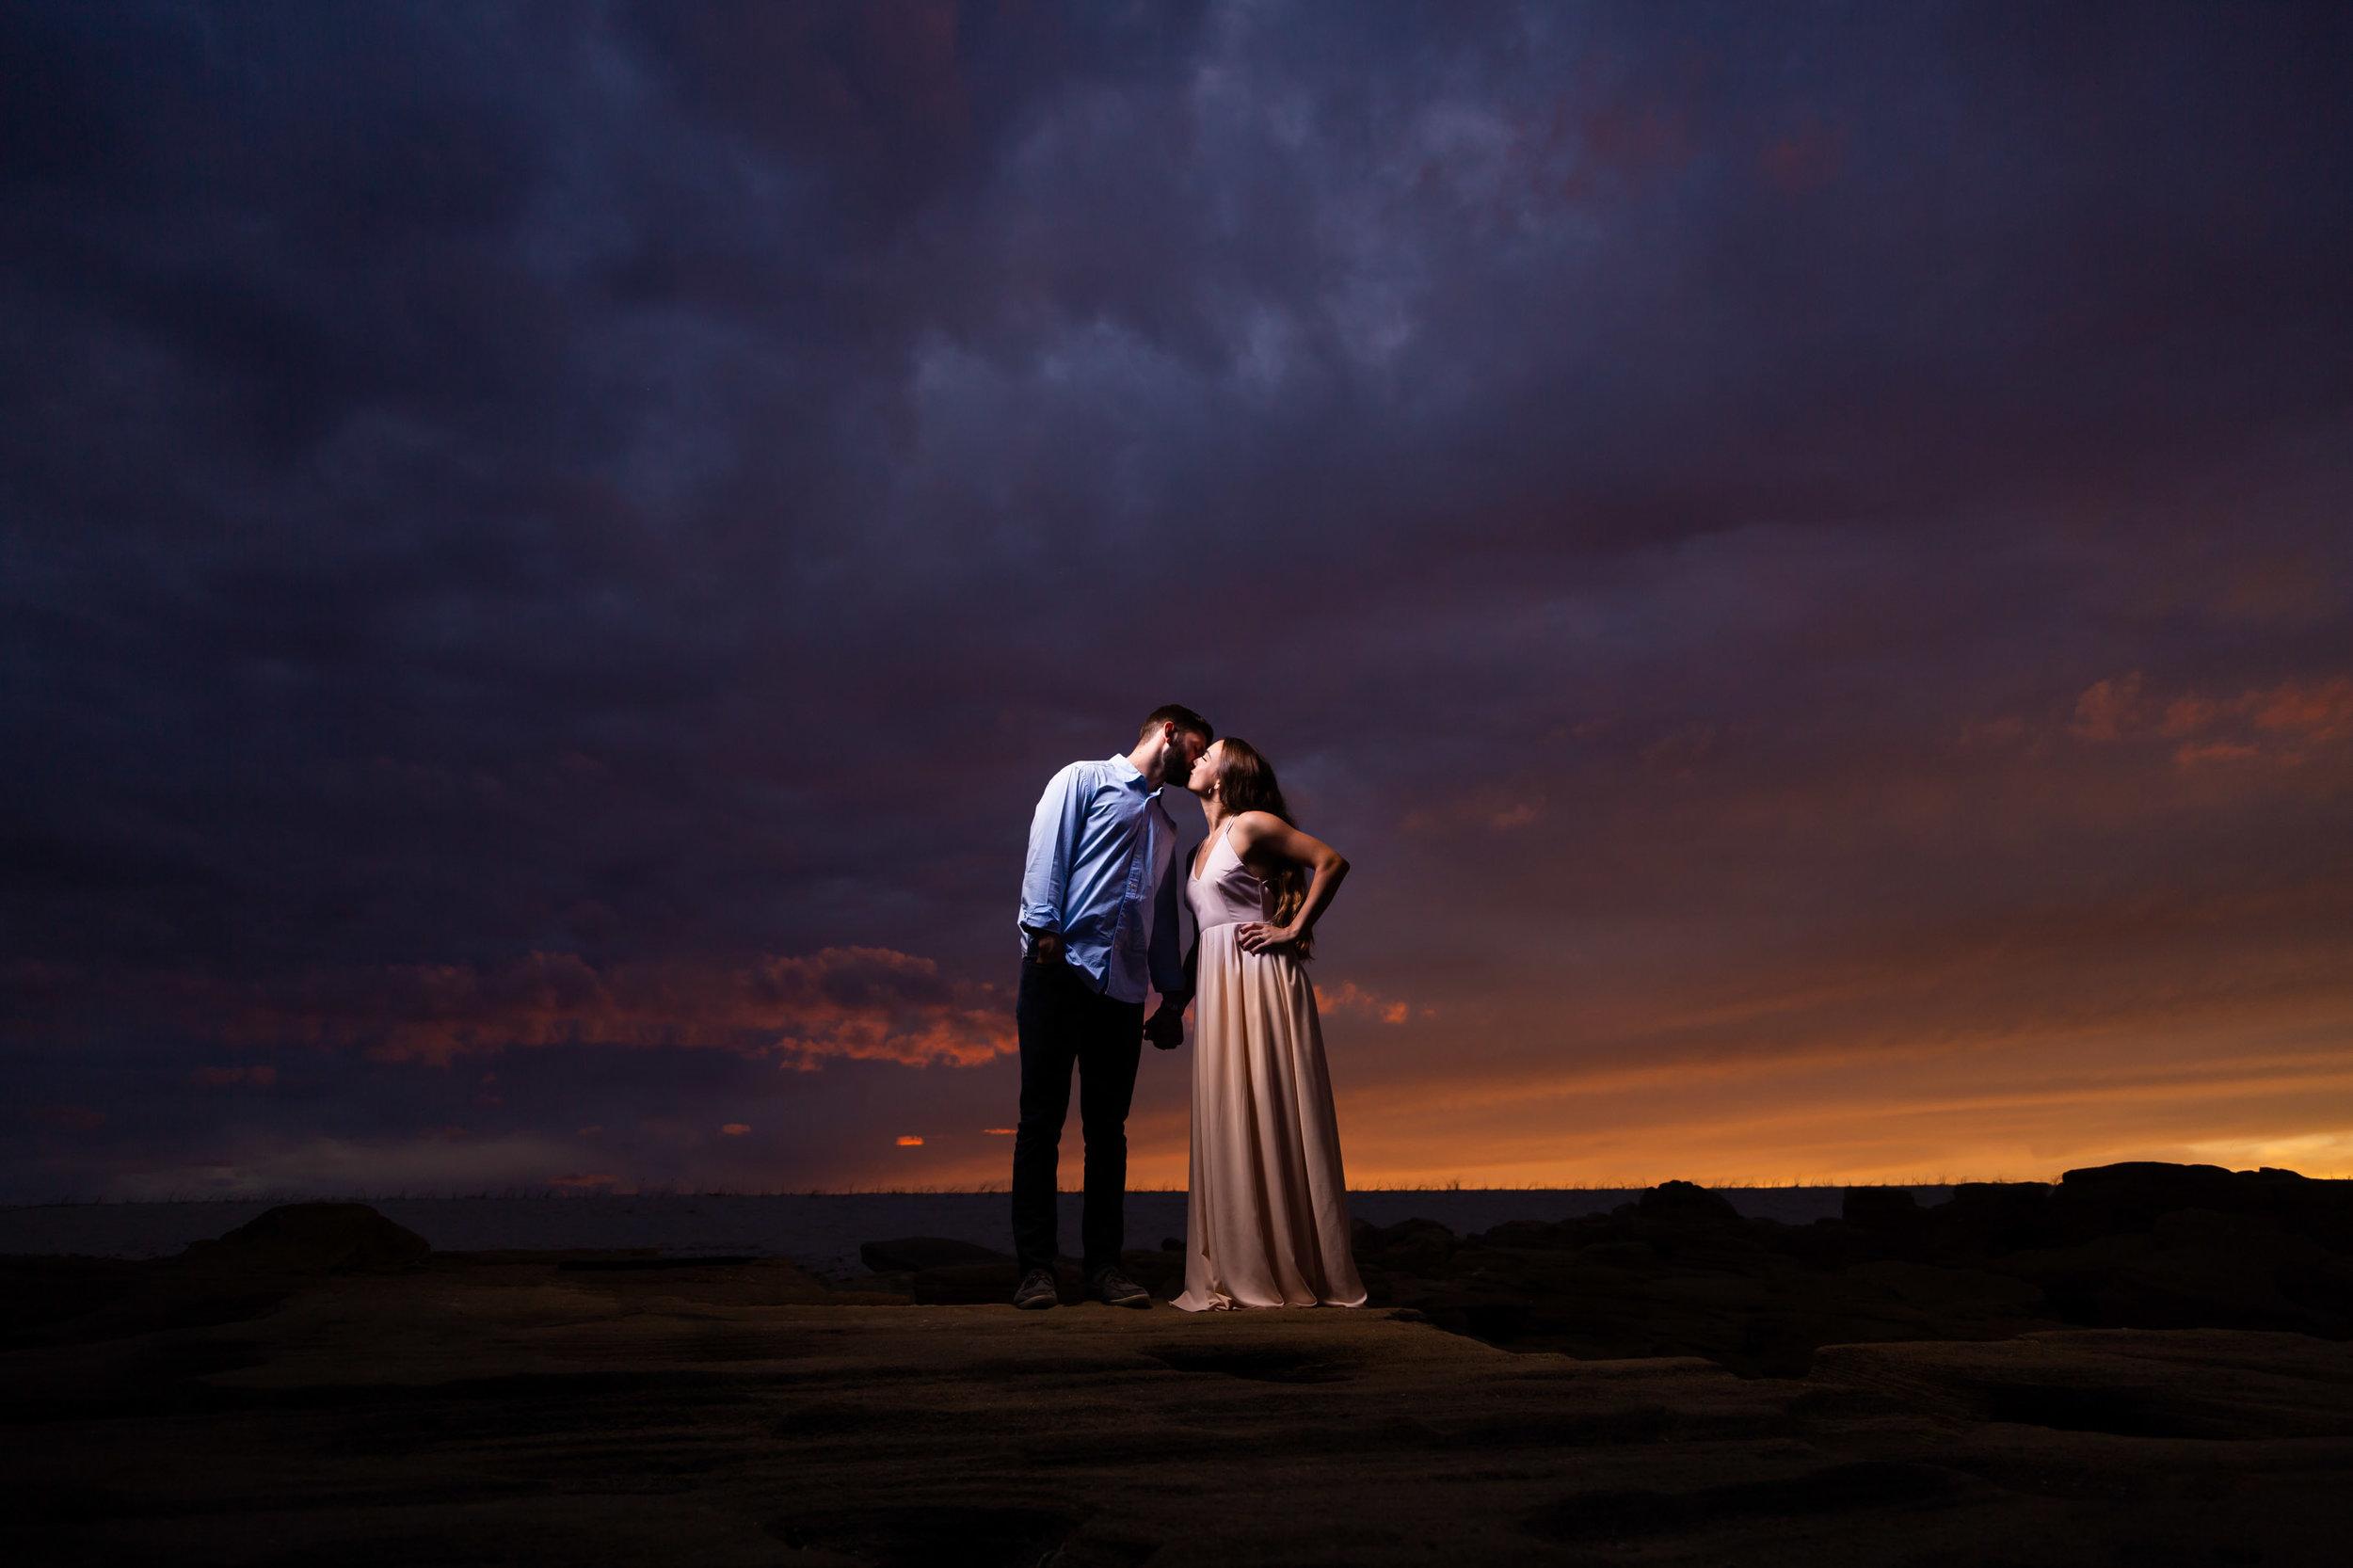 adam-szarmack-jacksonville-wedding-photographer-palm-coast-washing-oaks-garden-state-park-engagement-58.jpg